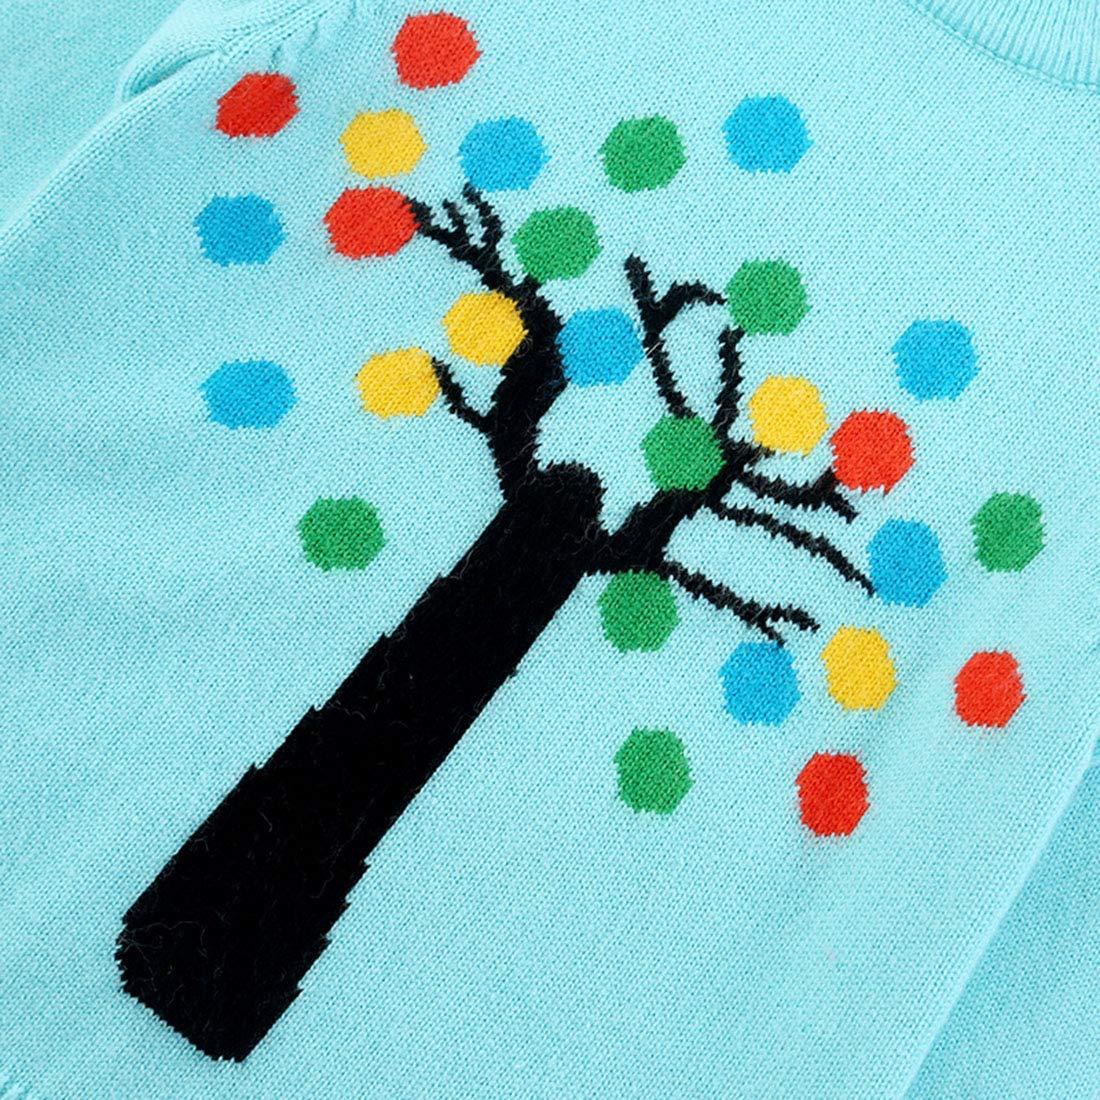 Euno Winter and Winter Sweater Childrens wear